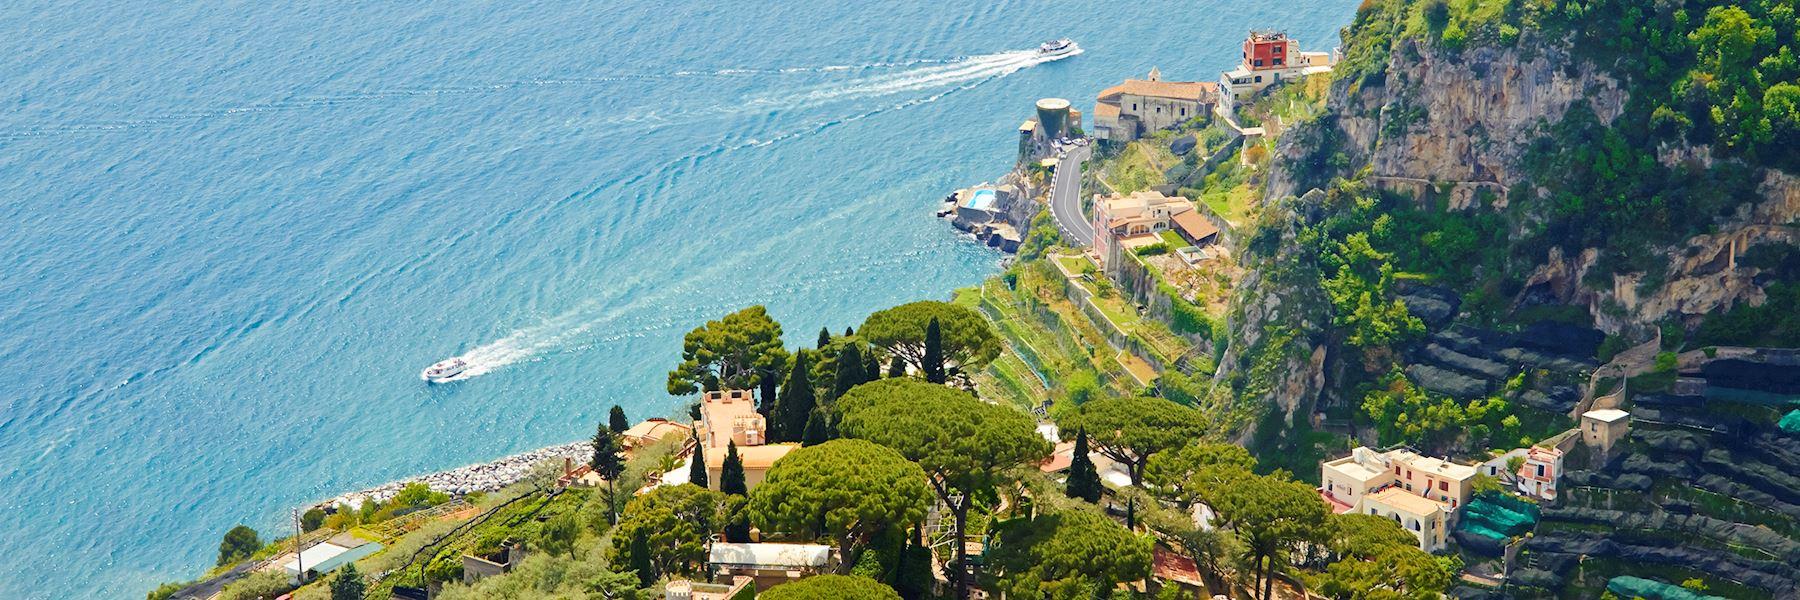 Amalfi Coast vacations